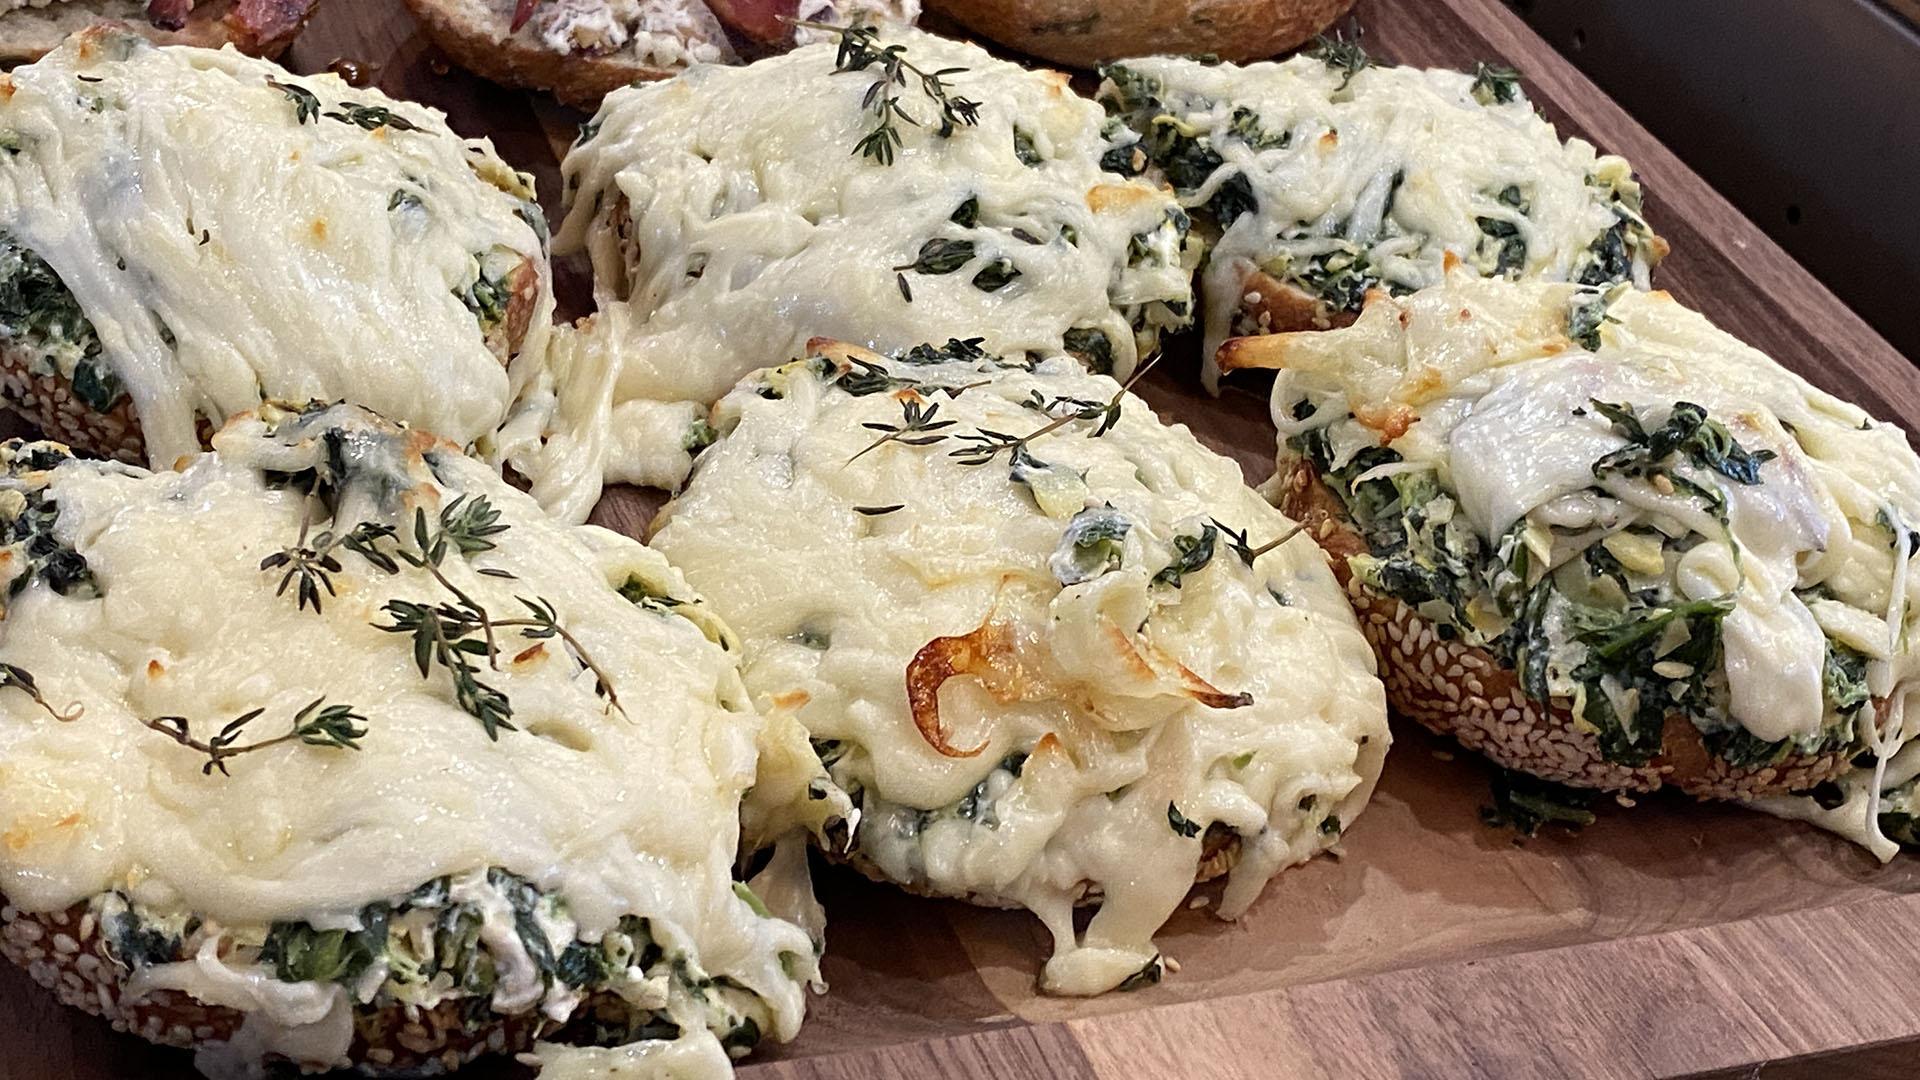 Warm Artichoke and Spinach Bagels | Bagel Lab